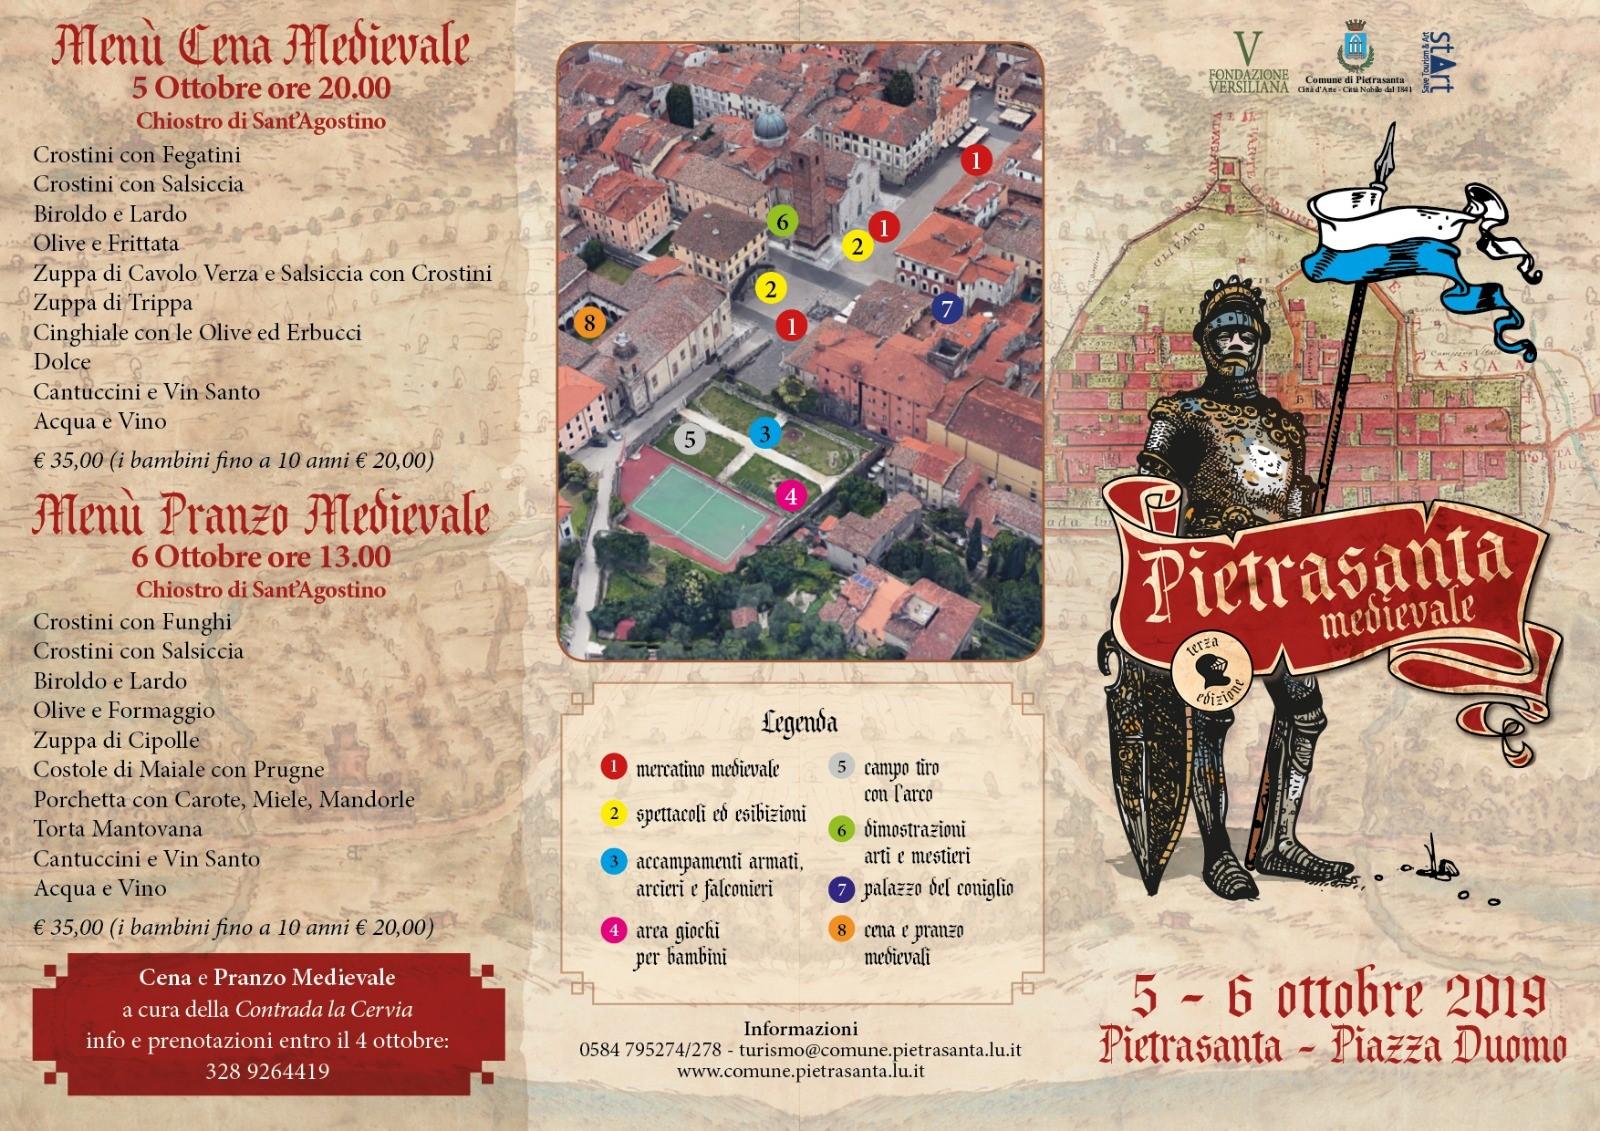 Pietrasanta Medievale 6-7 Ottobre